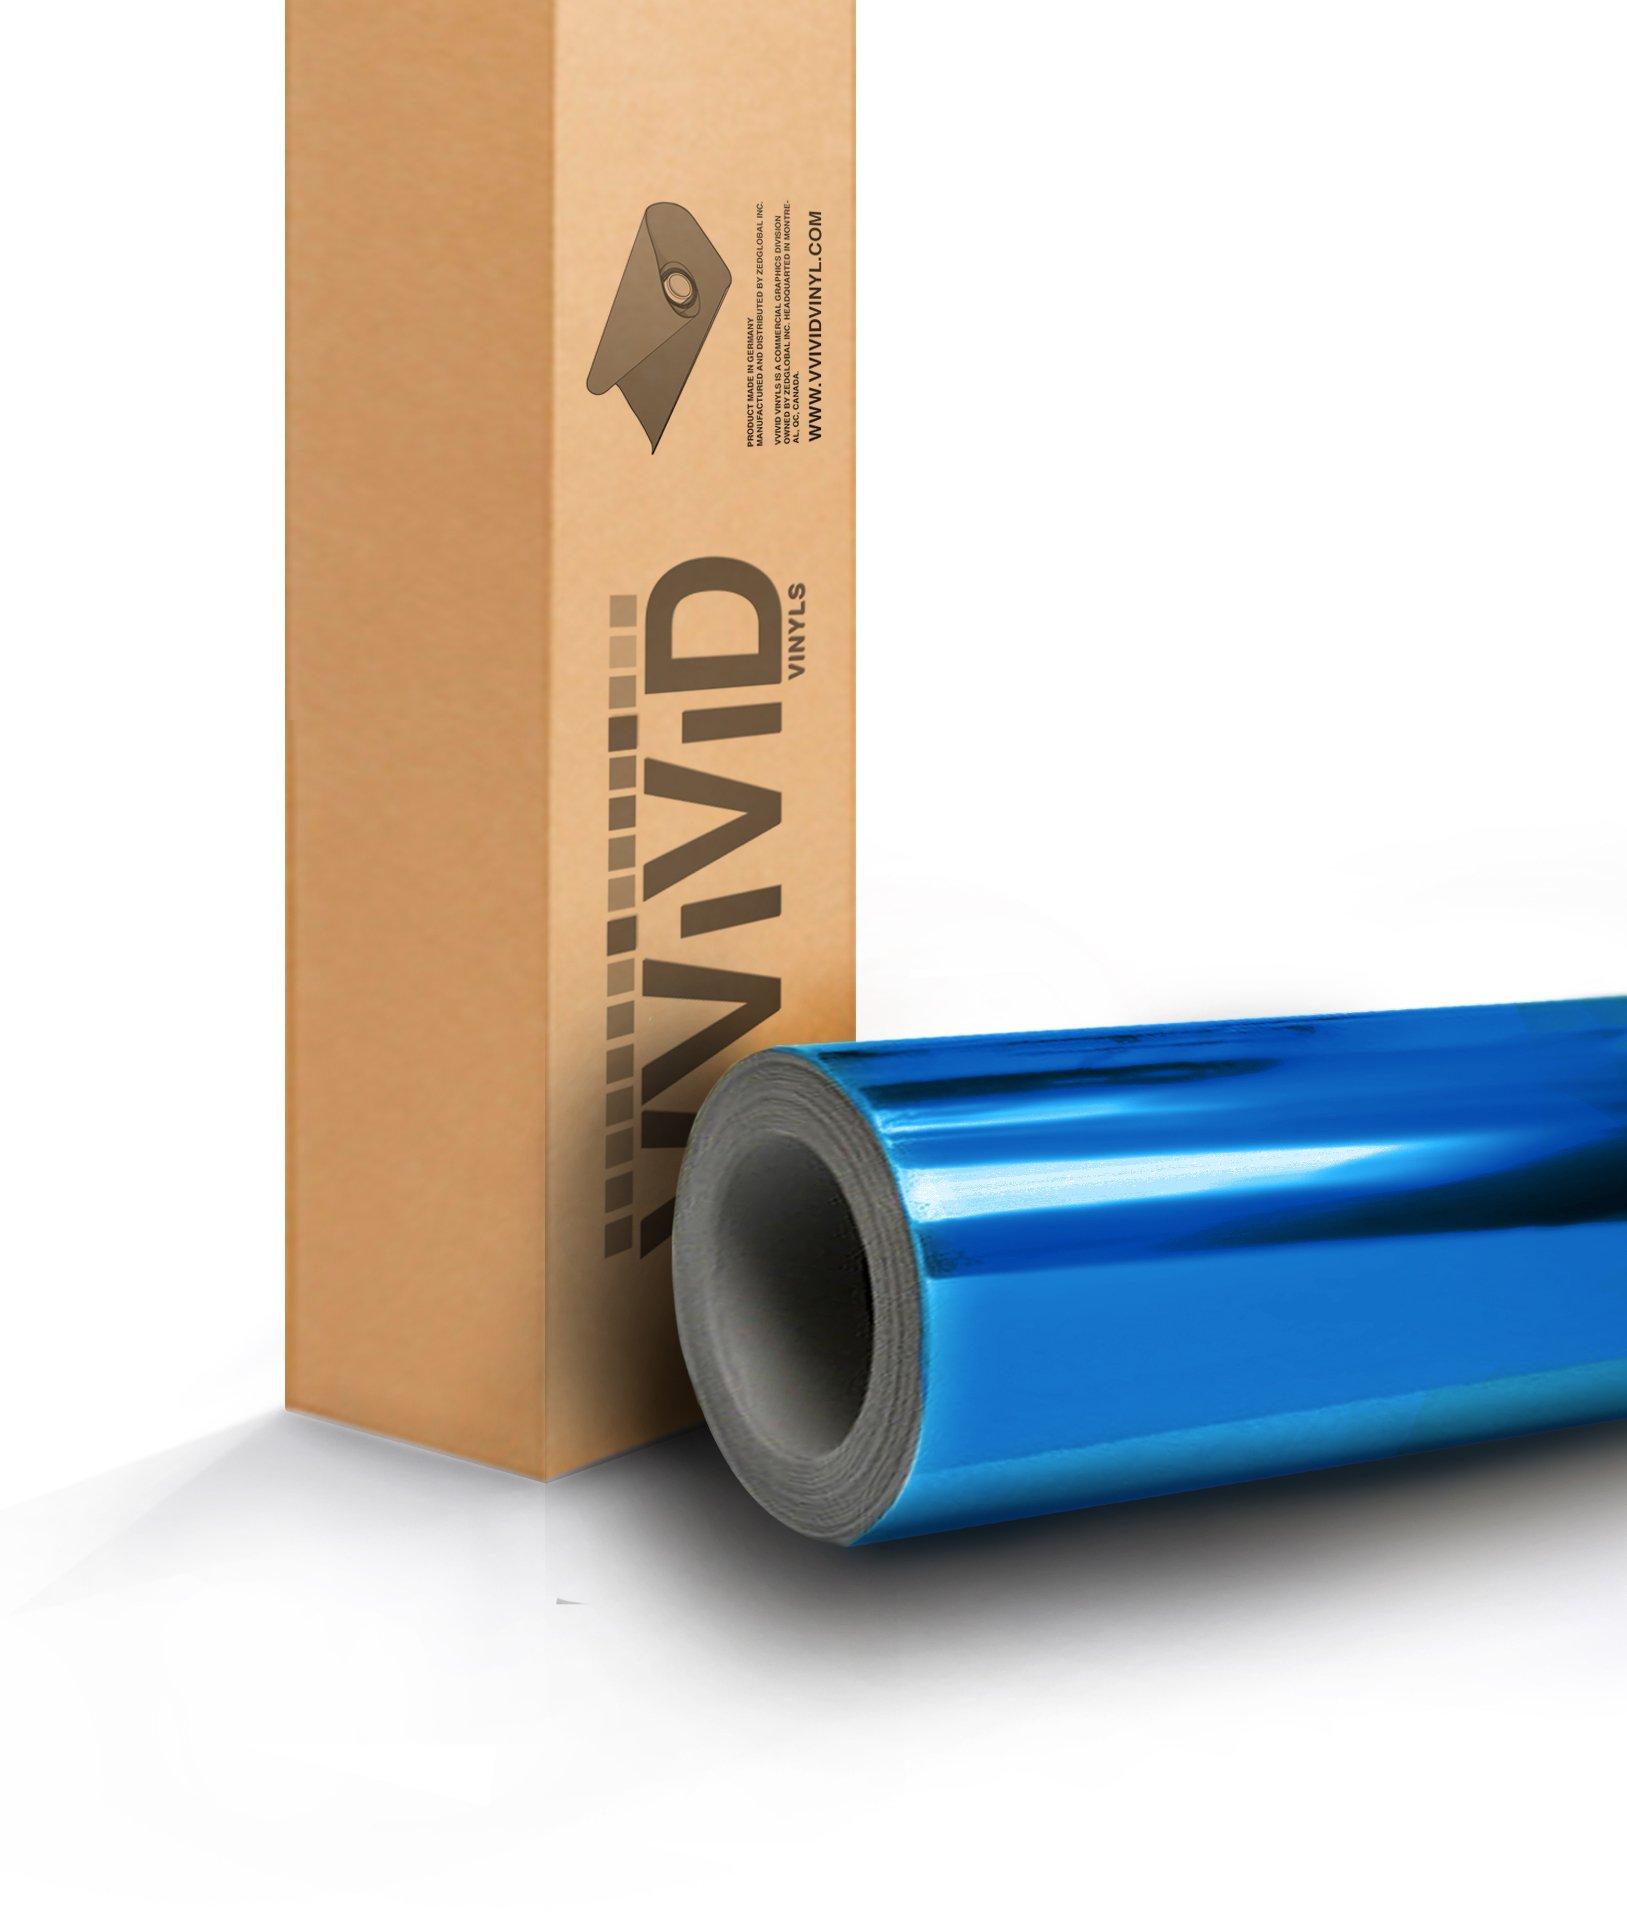 Blue Mirror Chrome Cast Vinyl Wrap Self-Adhesive Film Decal Air-Release Bubble and Air-Free 3MIL-VViViD8 (100ft x 5ft (Bulk Wrap Kit))